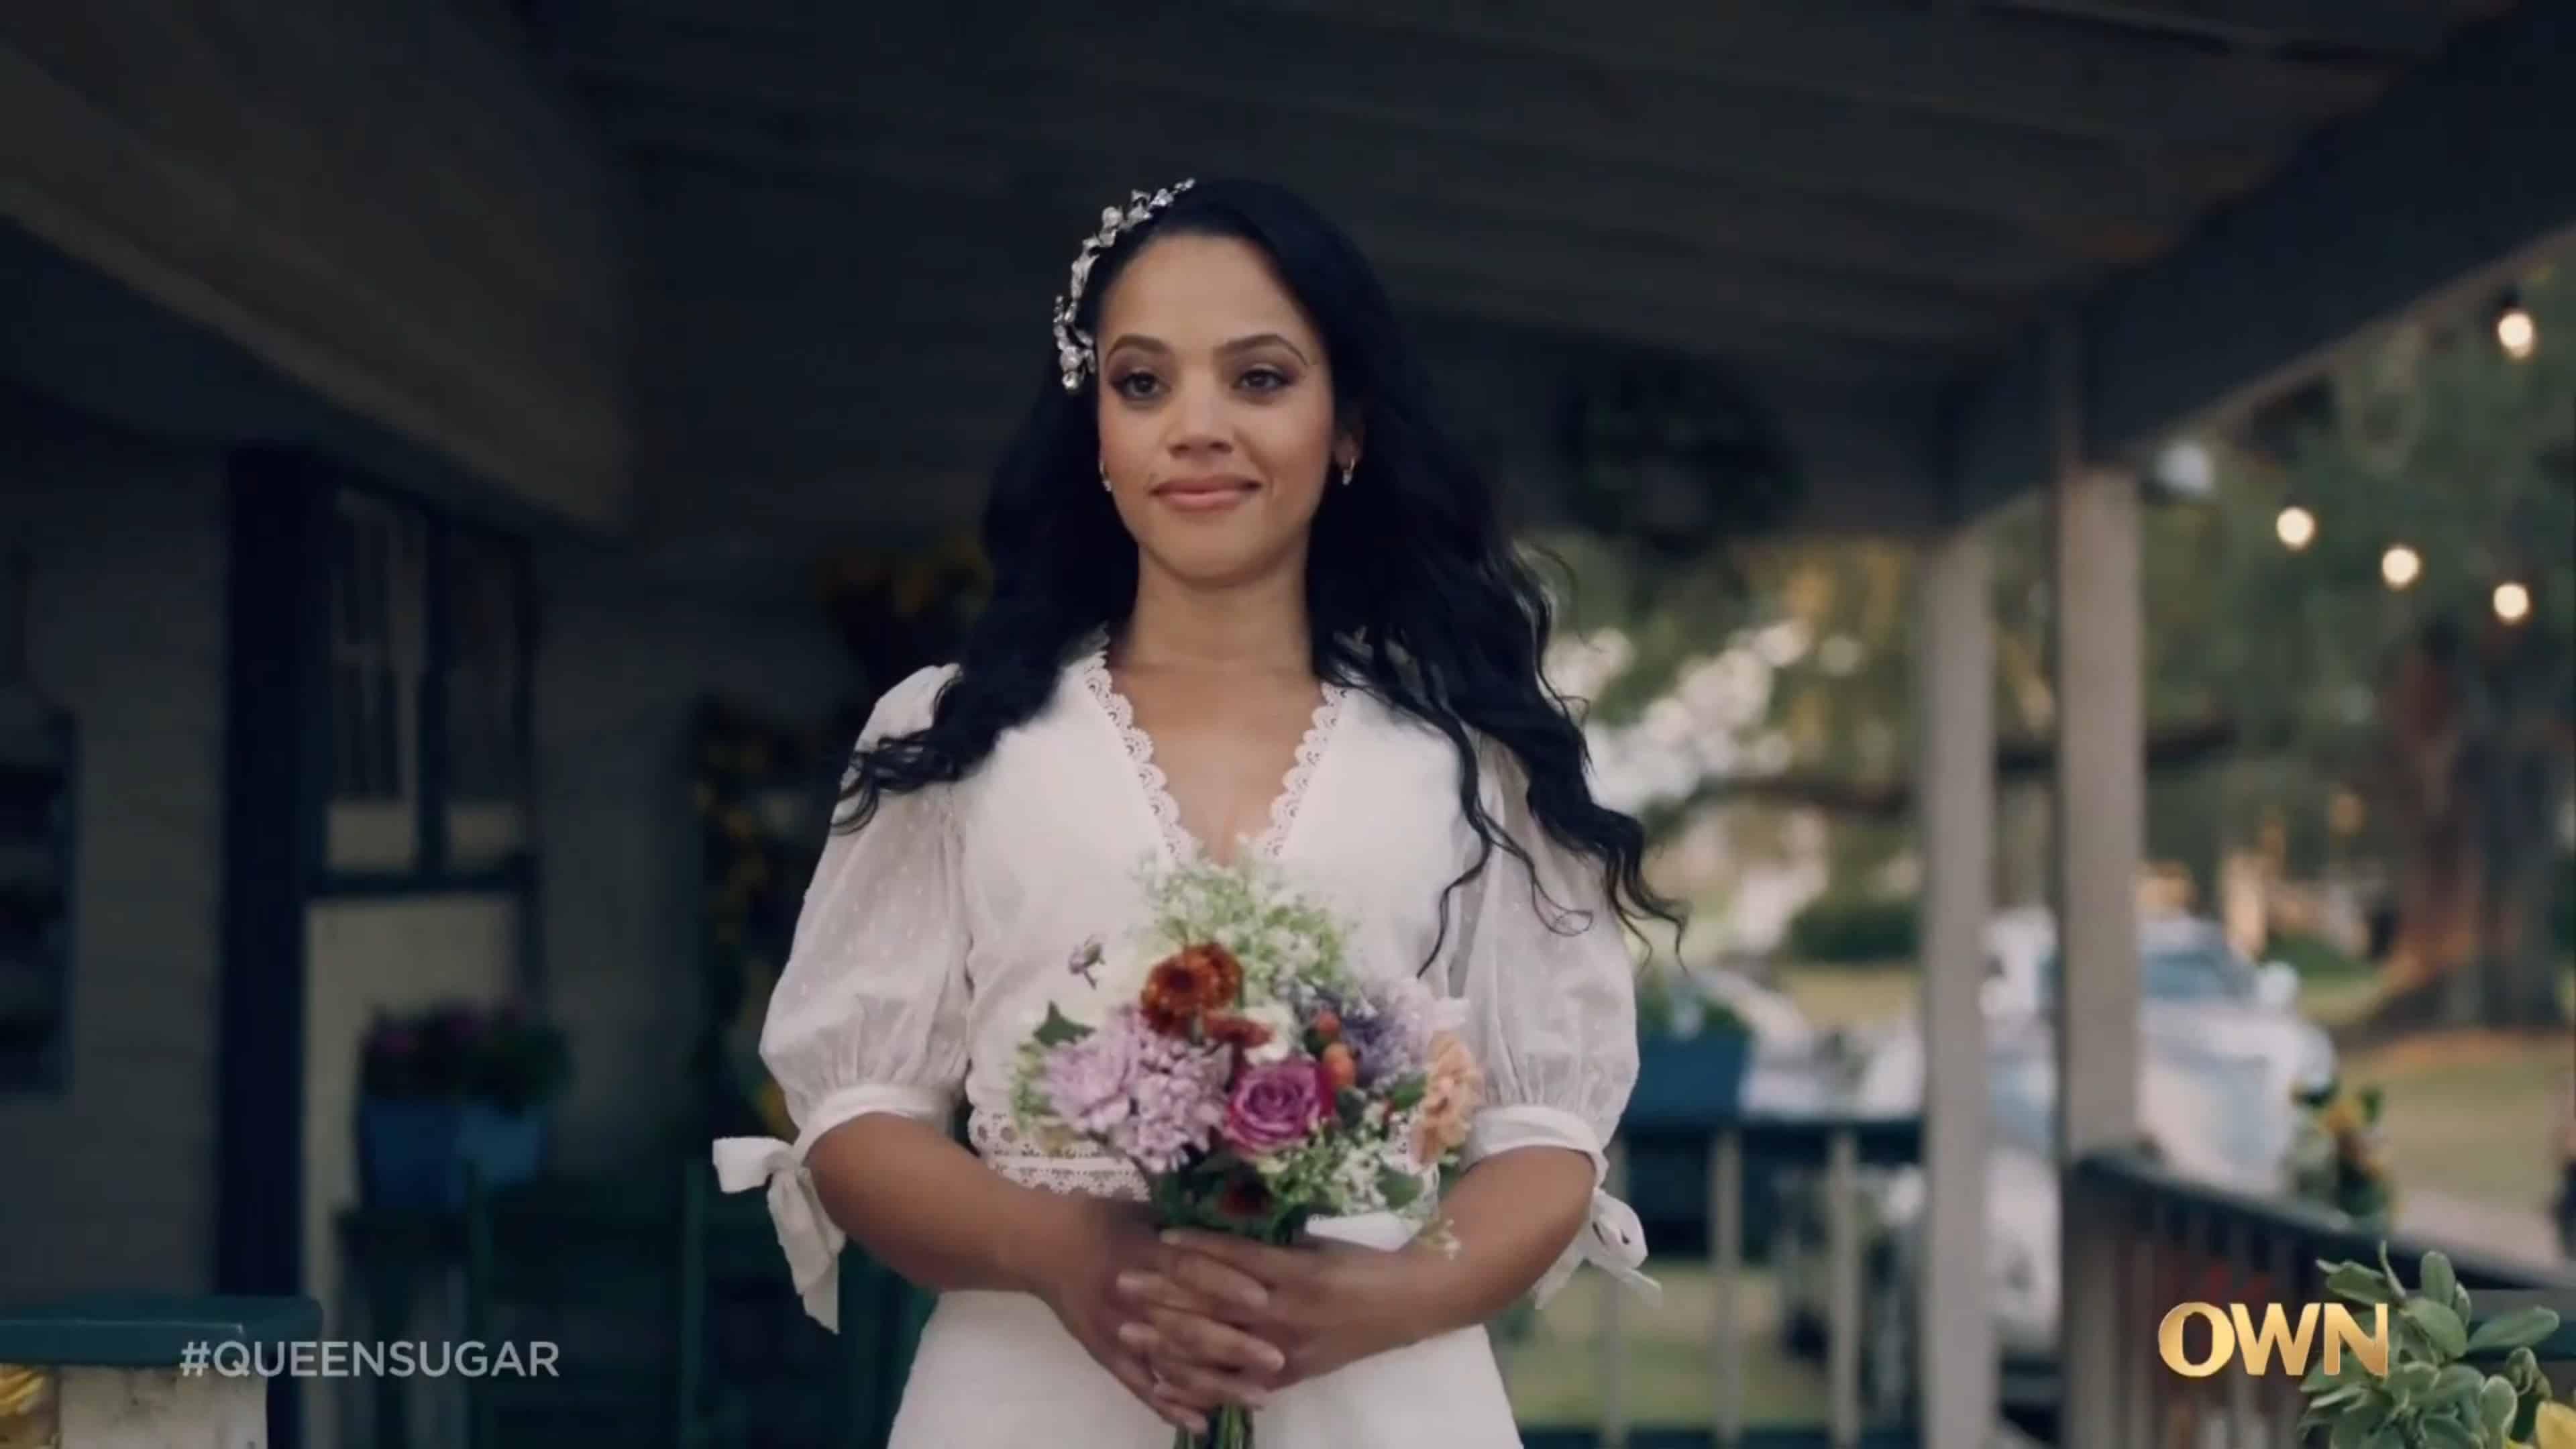 Darla in her wedding dress